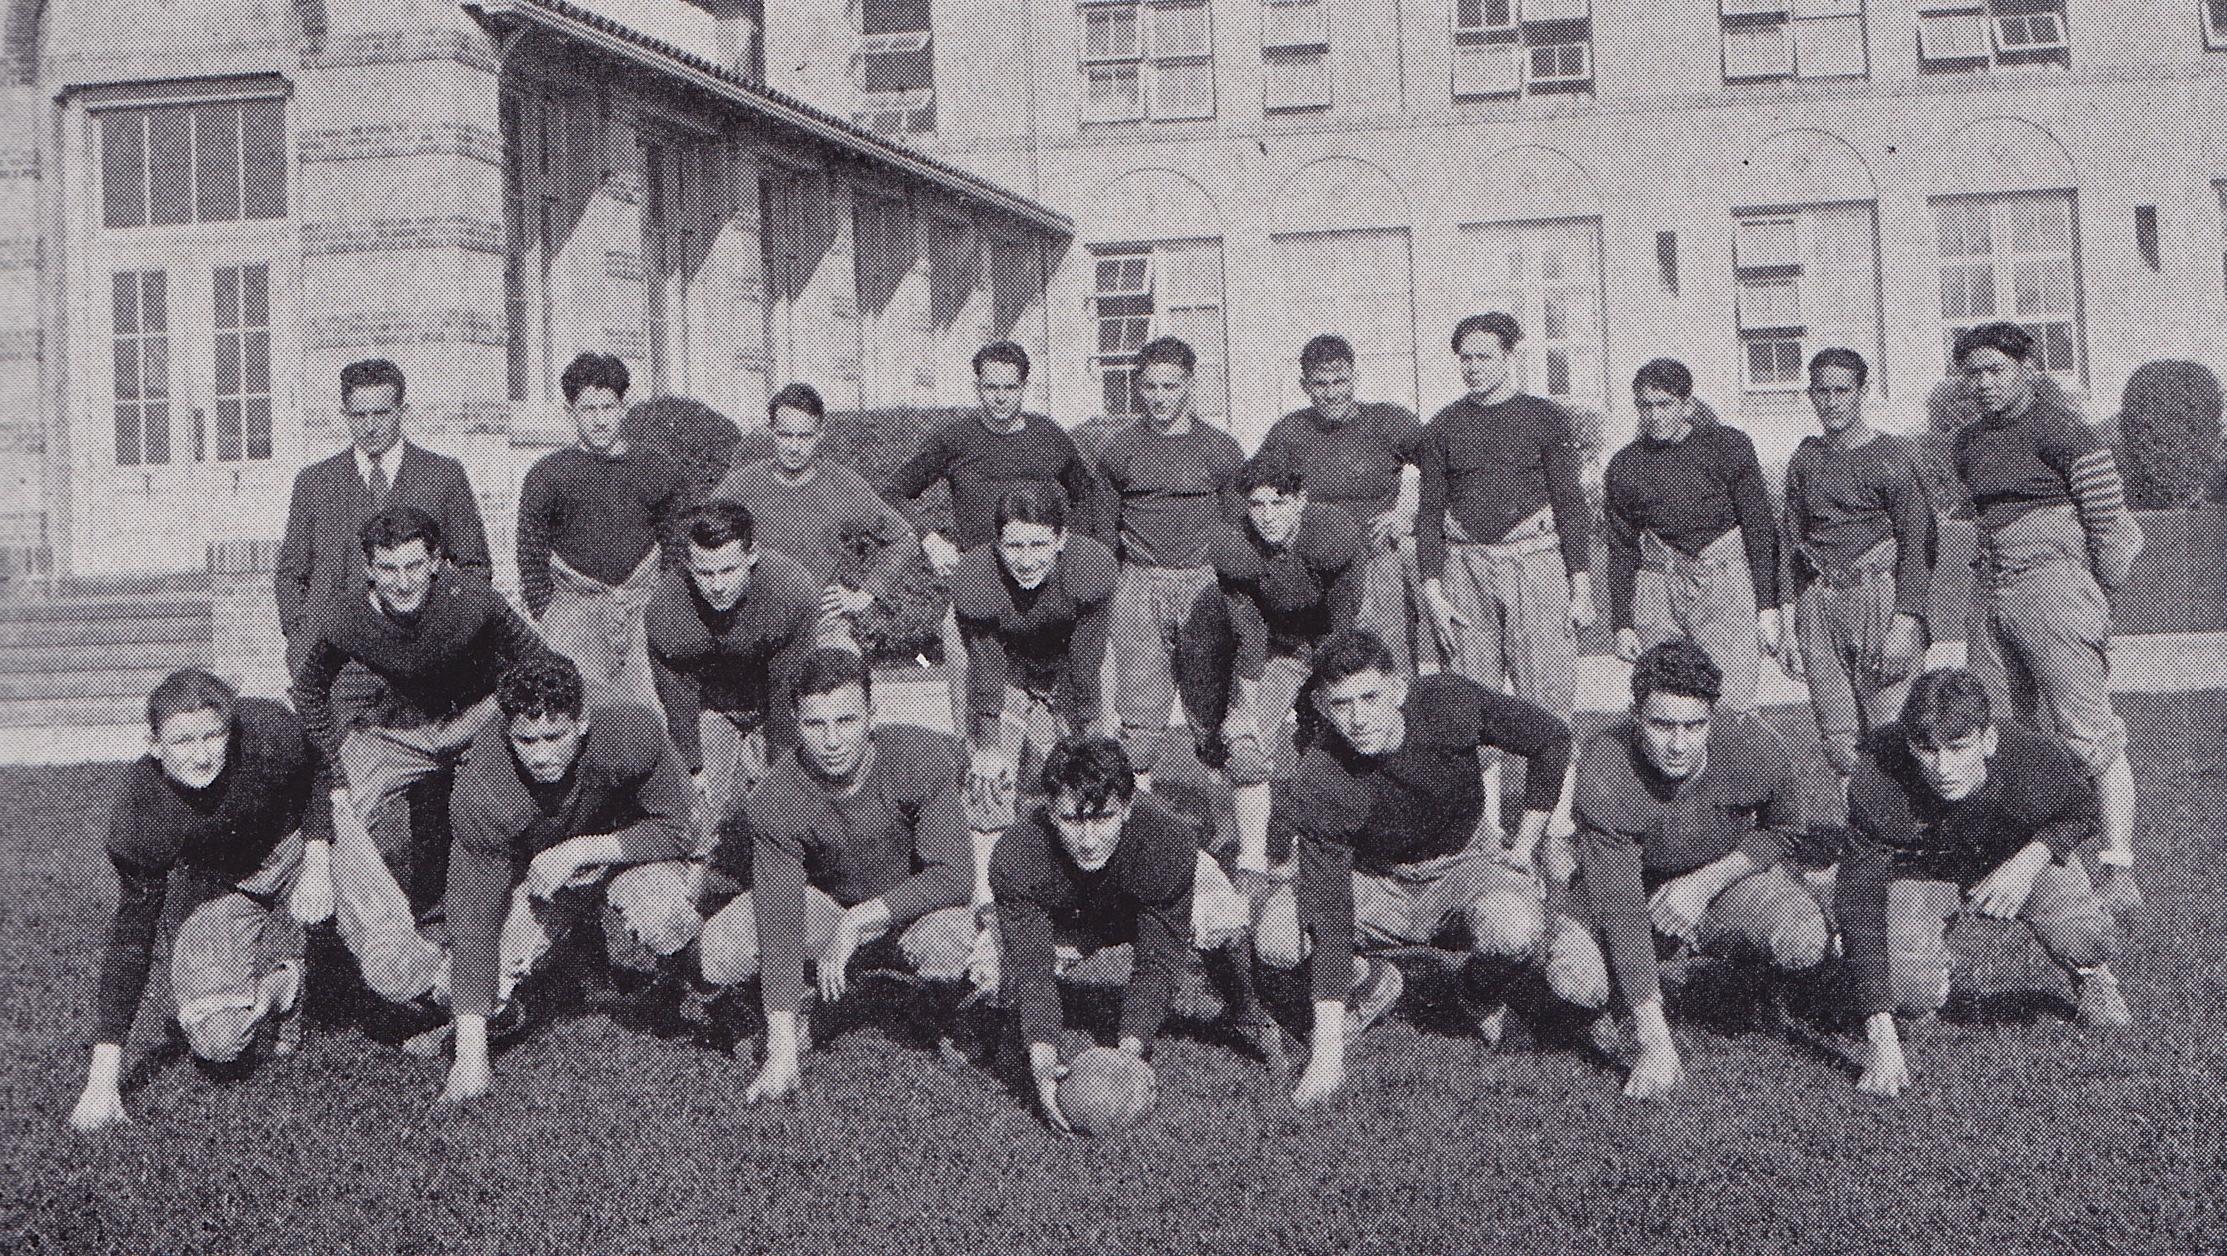 Football (1931)